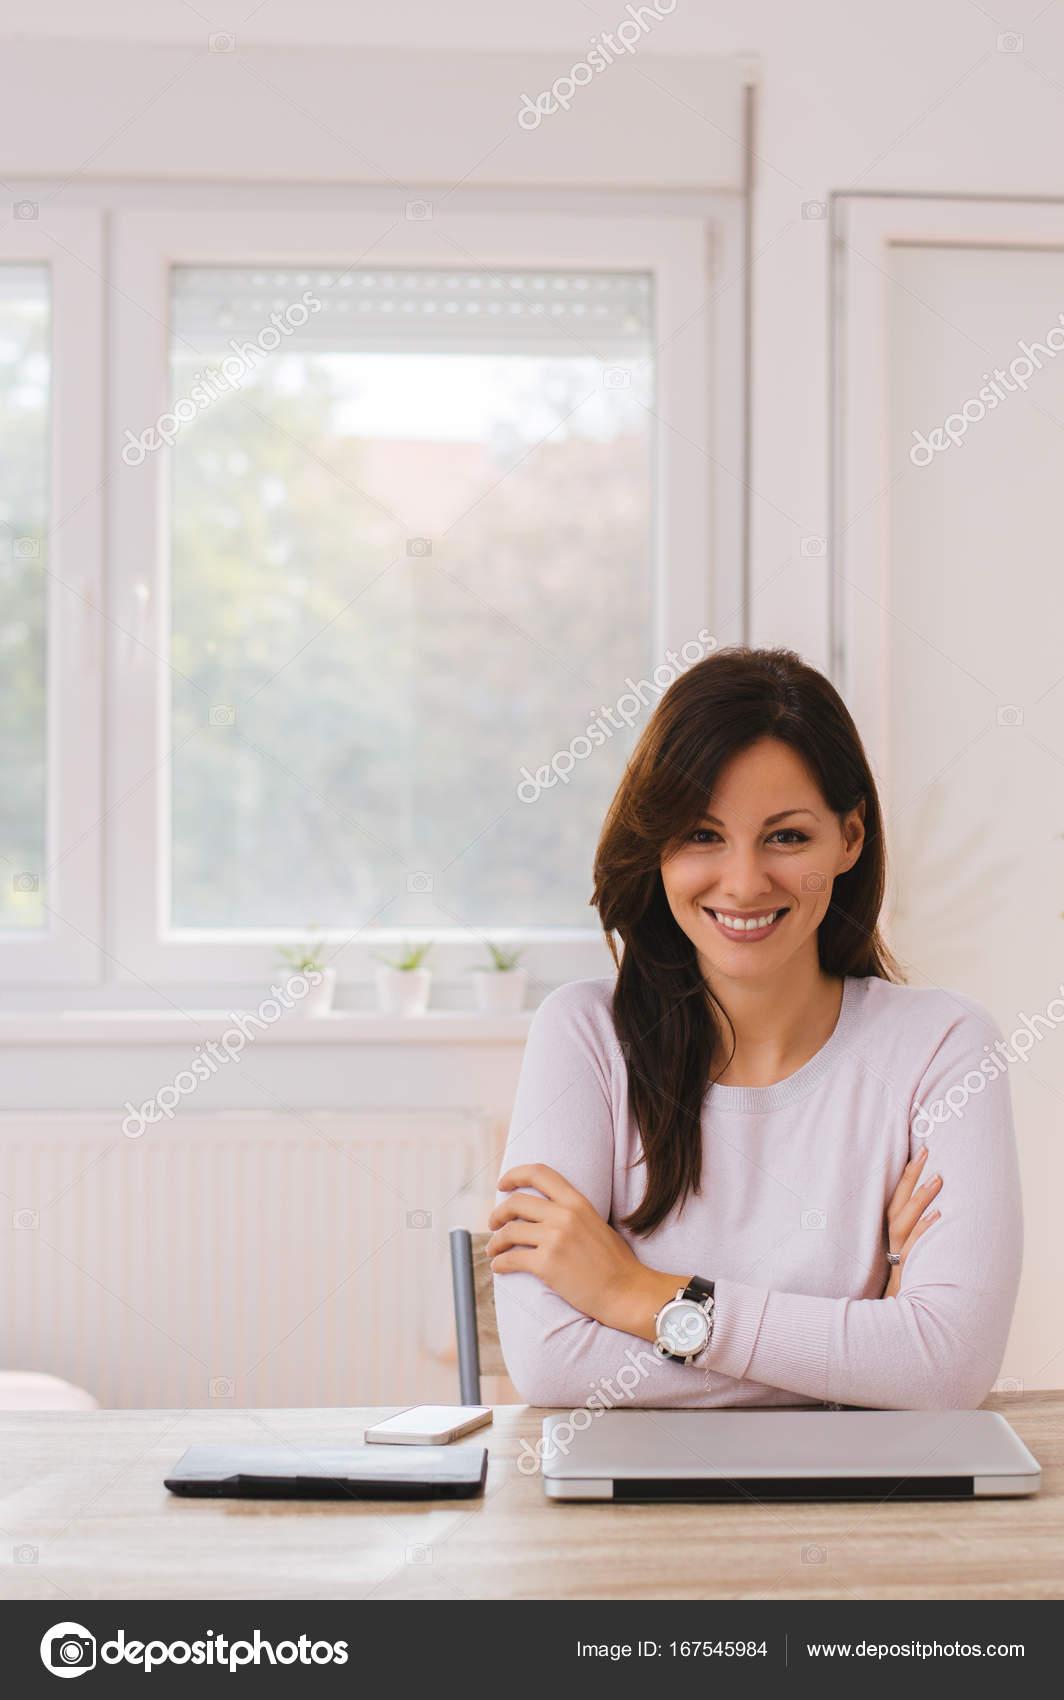 https://st3.depositphotos.com/13812178/16754/i/1600/depositphotos_167545984-stock-photo-woman-working-from-home-office.jpg